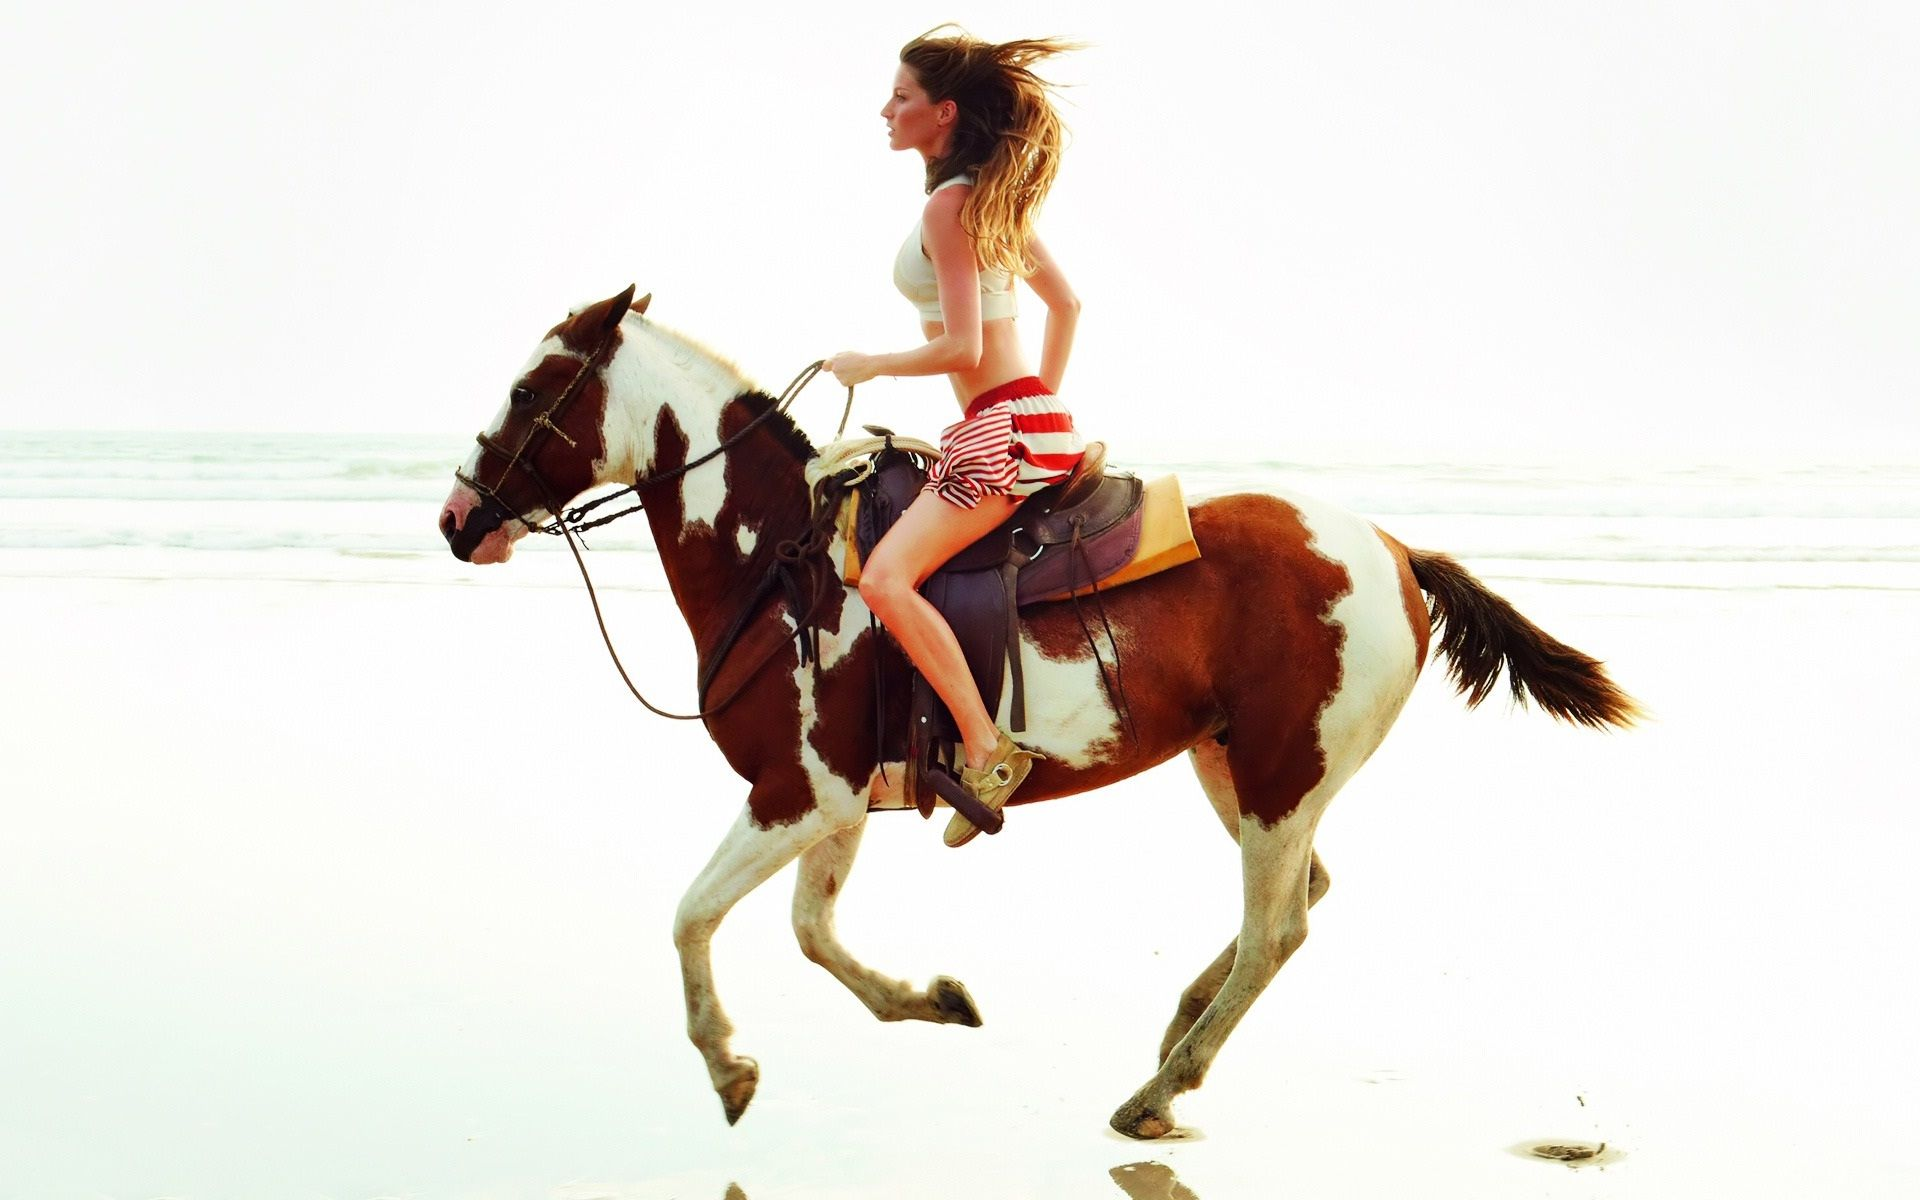 Wonderful Wallpaper Horse Girly - 76bda730f3d1804ba92ee4b29344f5c4  Best Photo Reference_809689.jpg